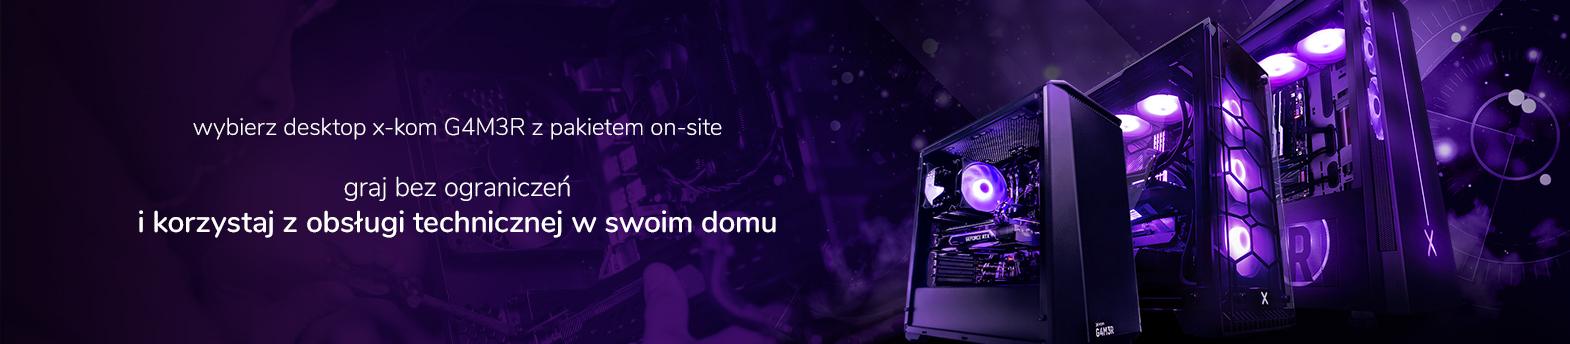 G4M3R z pakietem on-site